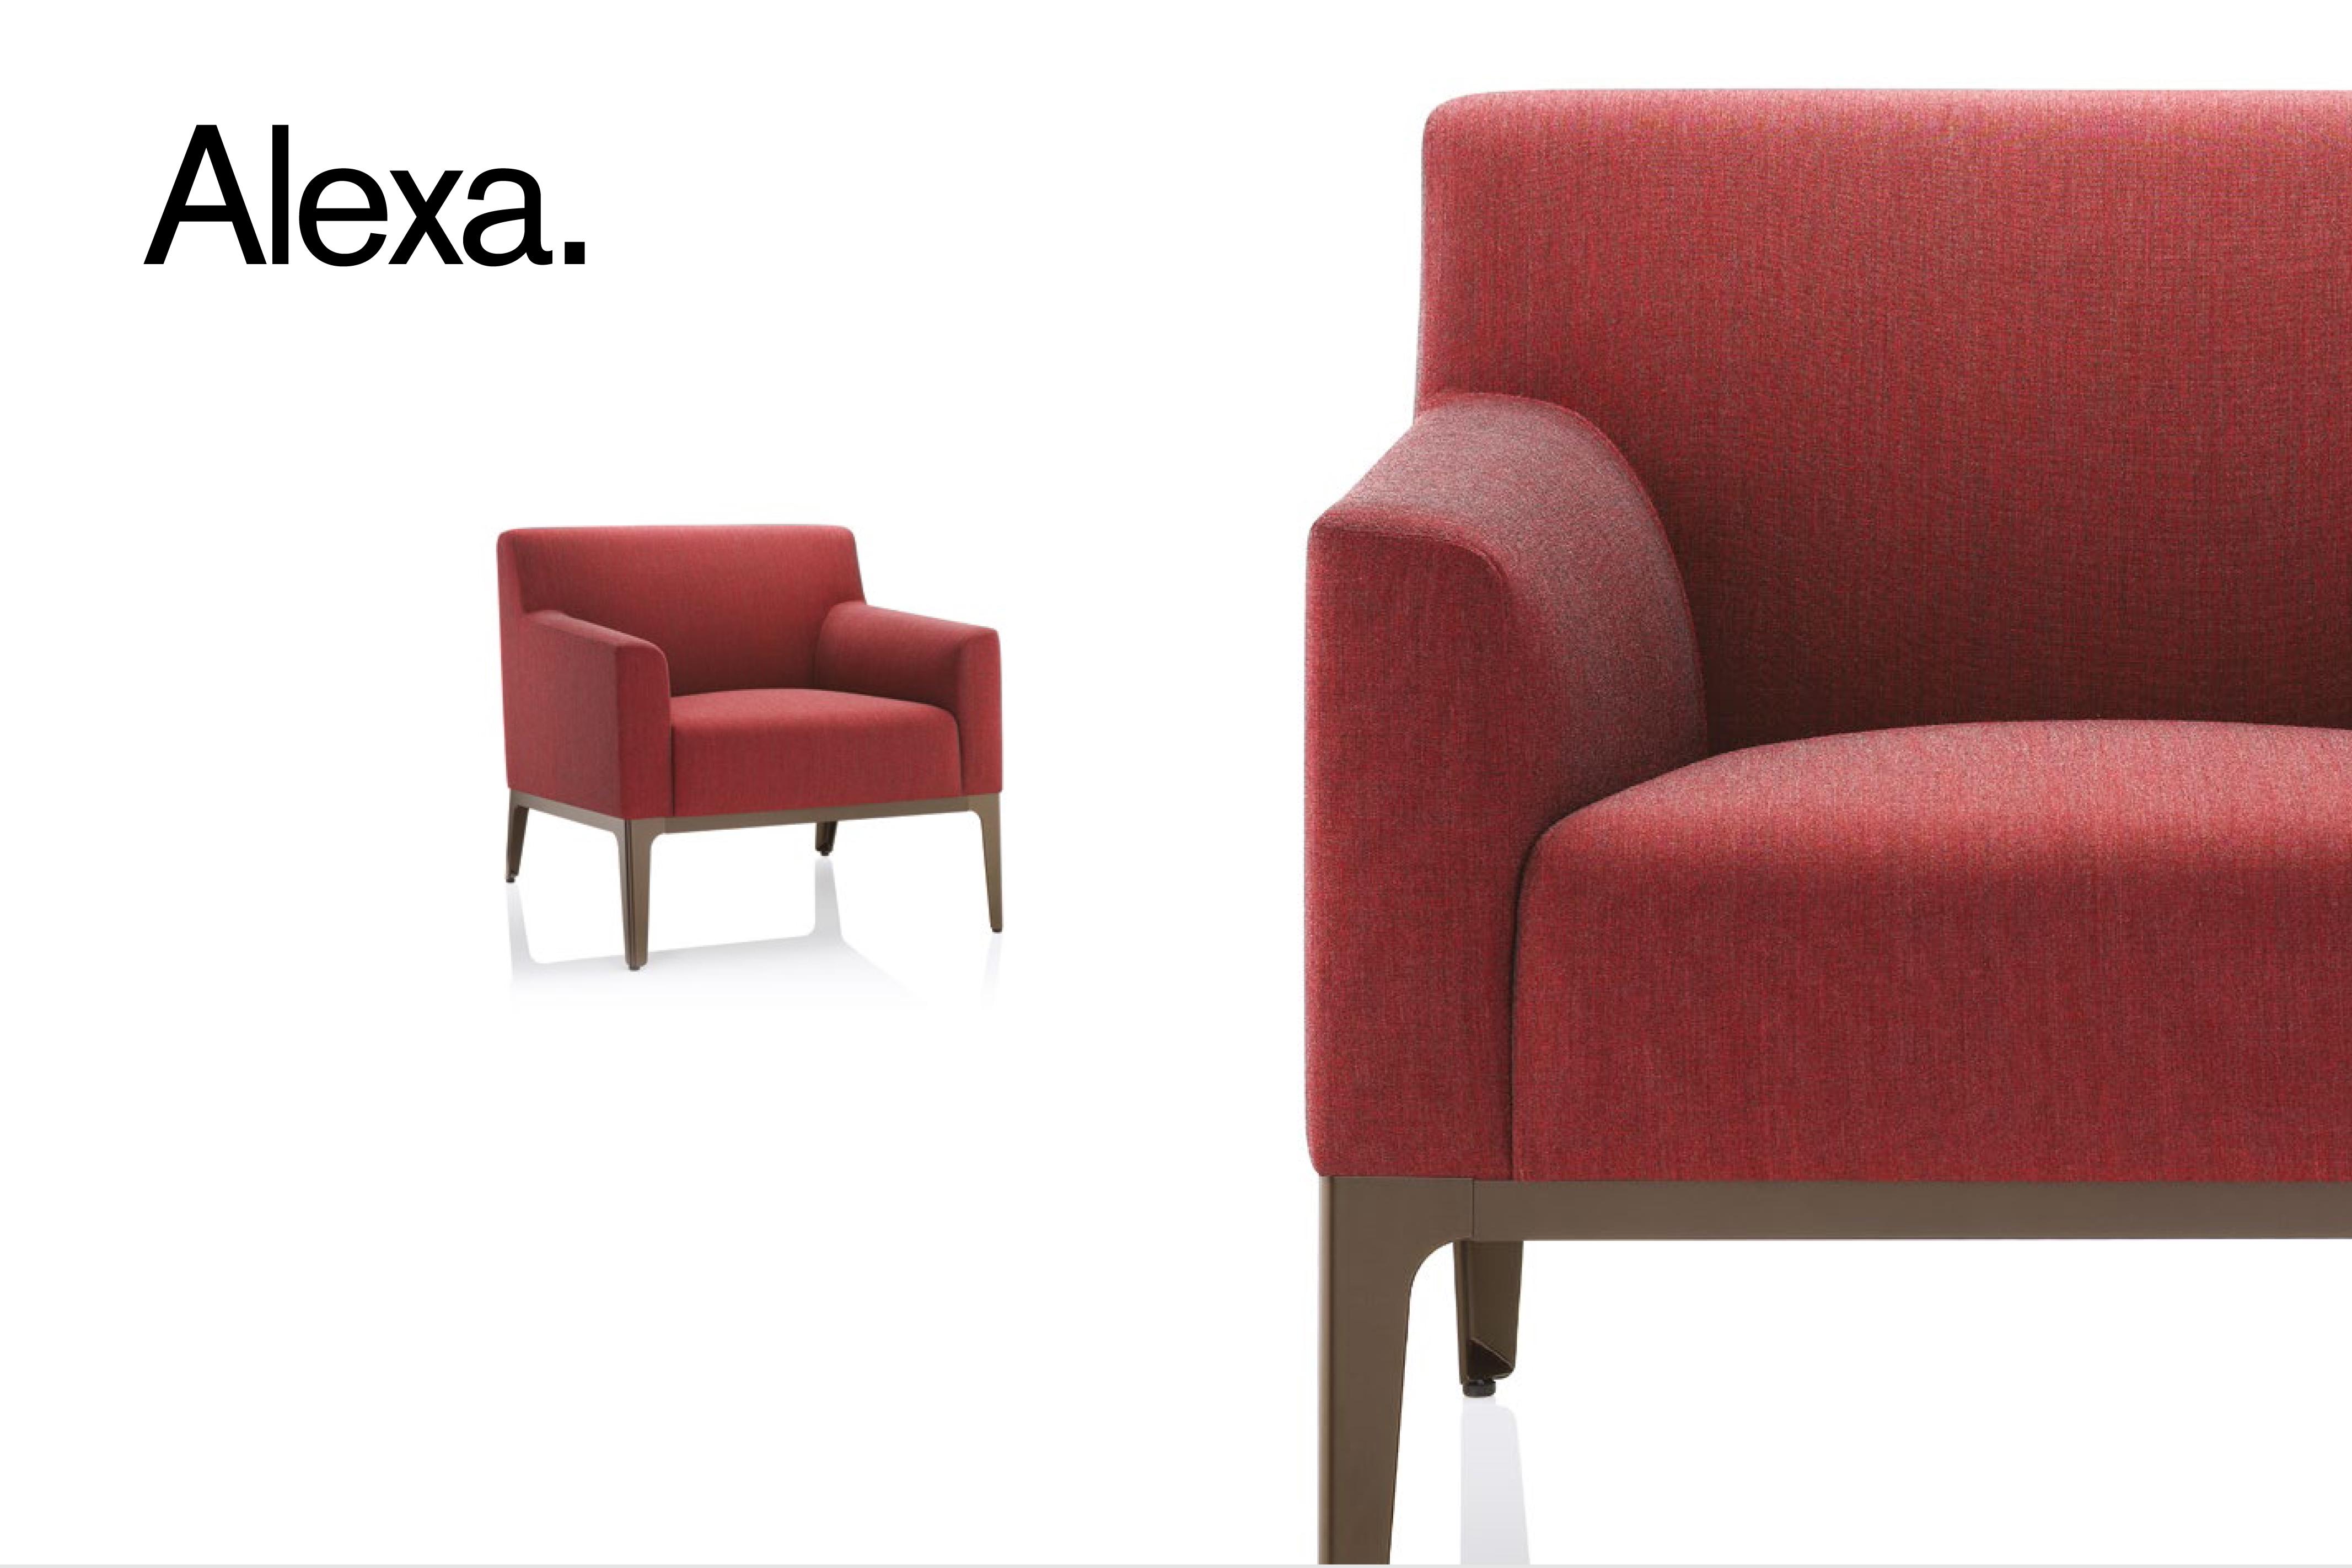 alexa-brochure-2.jpg